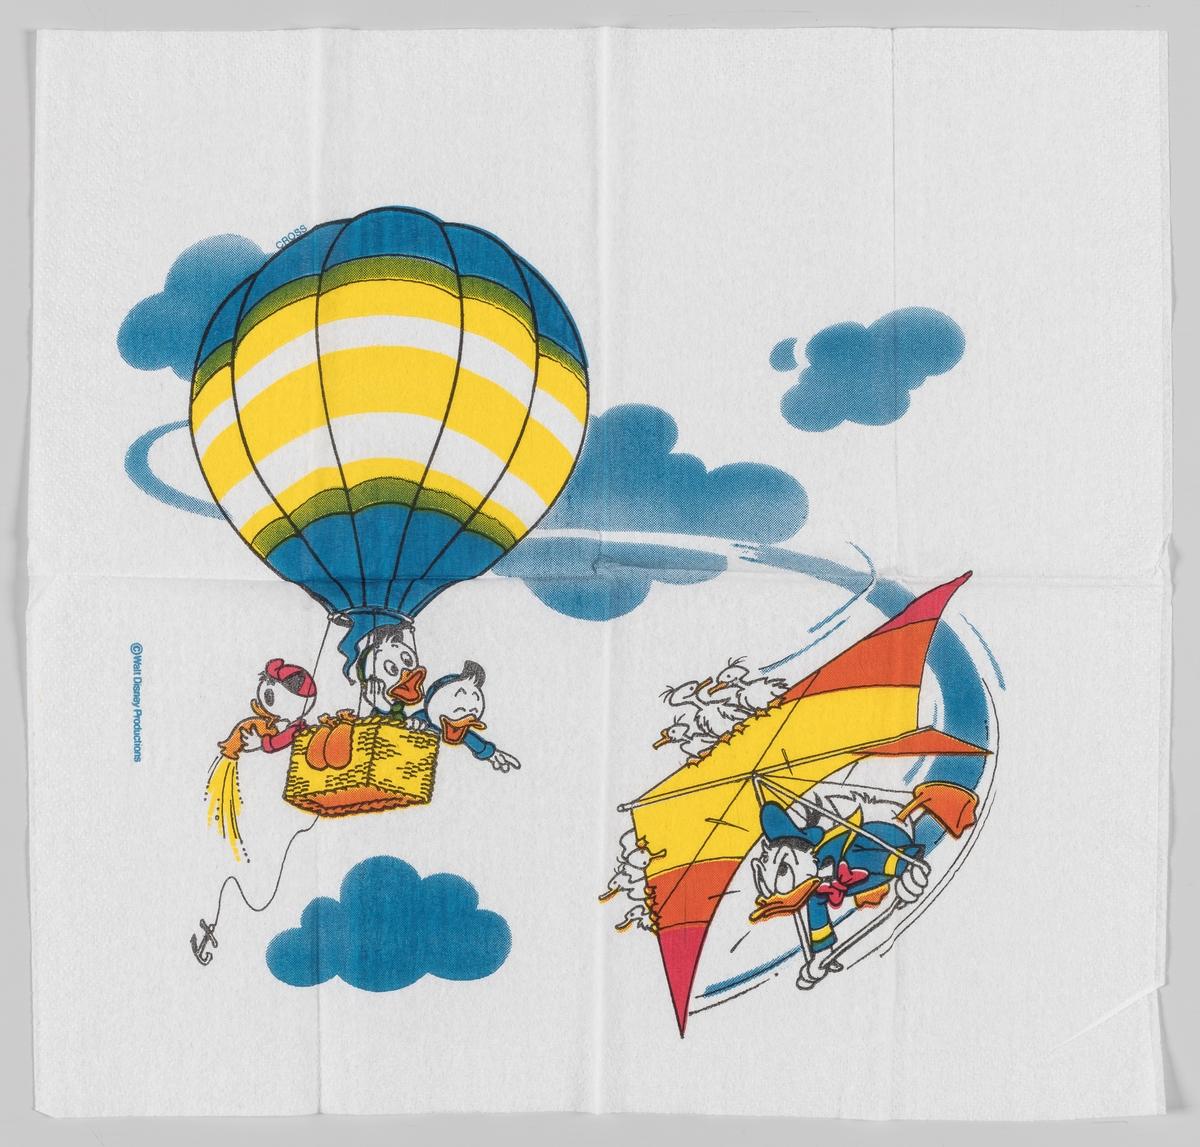 Ole, Dole og Doffen flyger i en ballong og Donald Duck kretser rundt dem med en hanglider